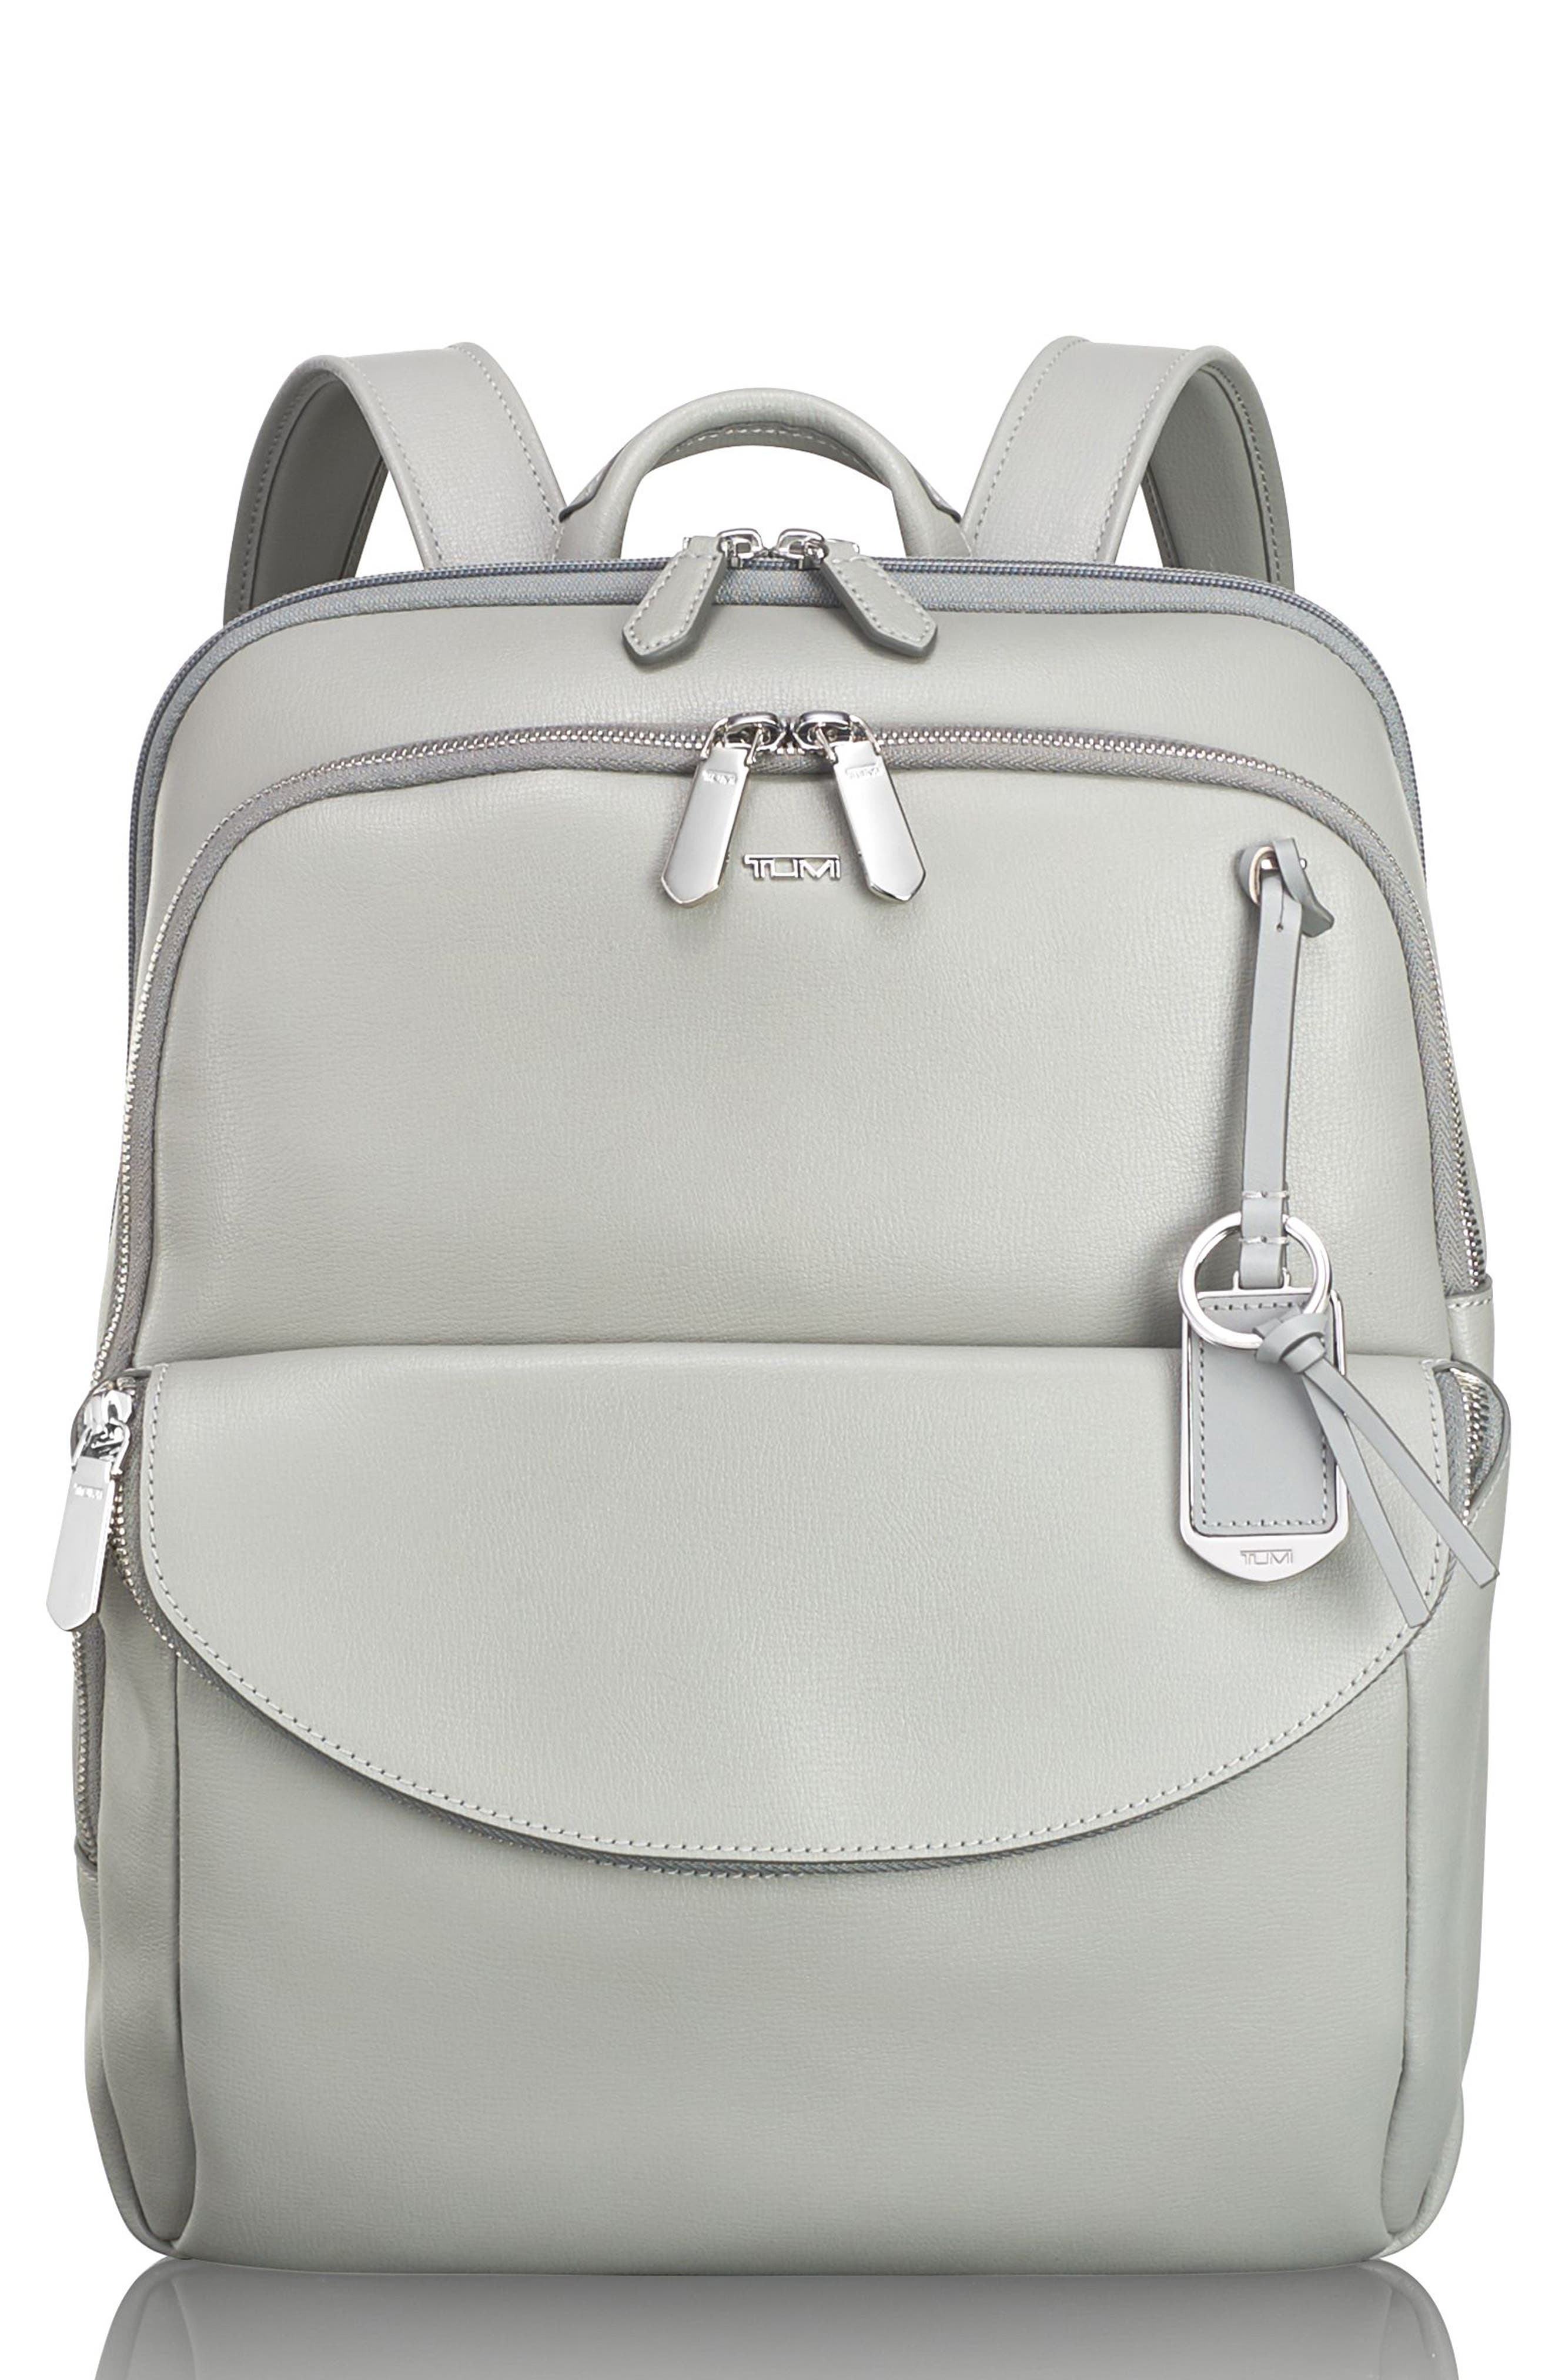 Stanton Hettie Leather Backpack,                             Main thumbnail 1, color,                             Light Grey